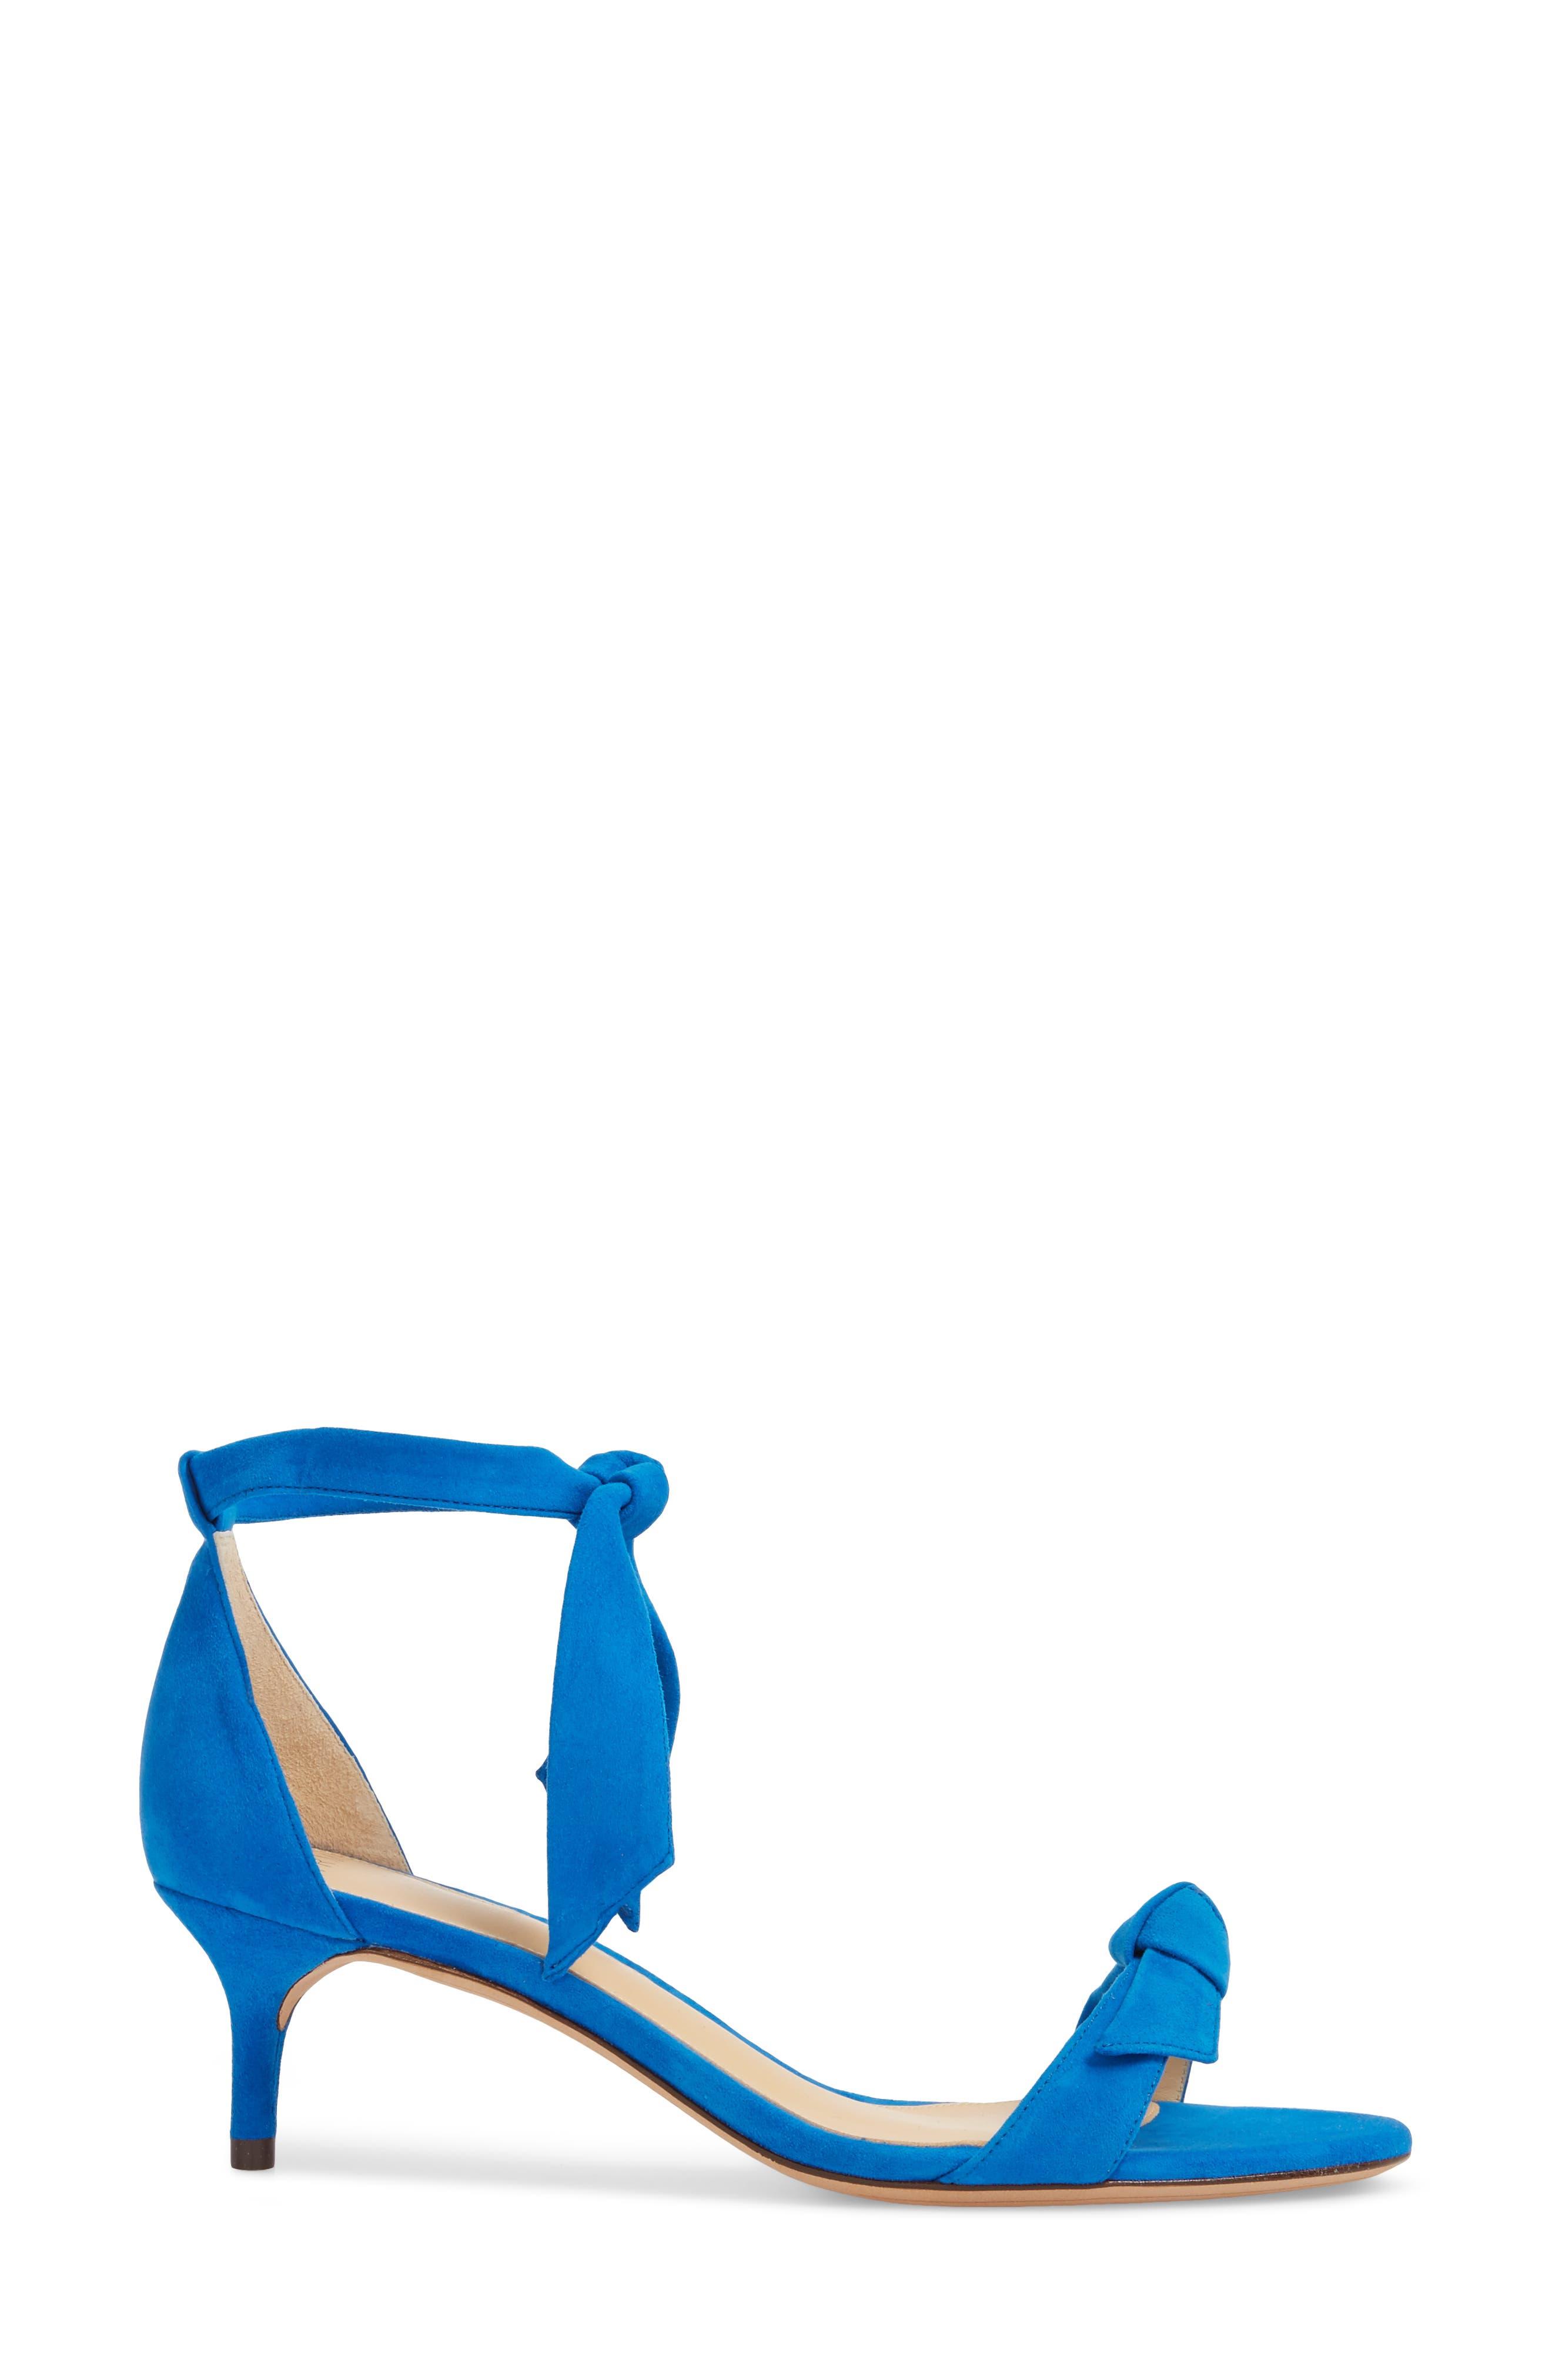 Clarita Knotted Sandal,                             Alternate thumbnail 3, color,                             400